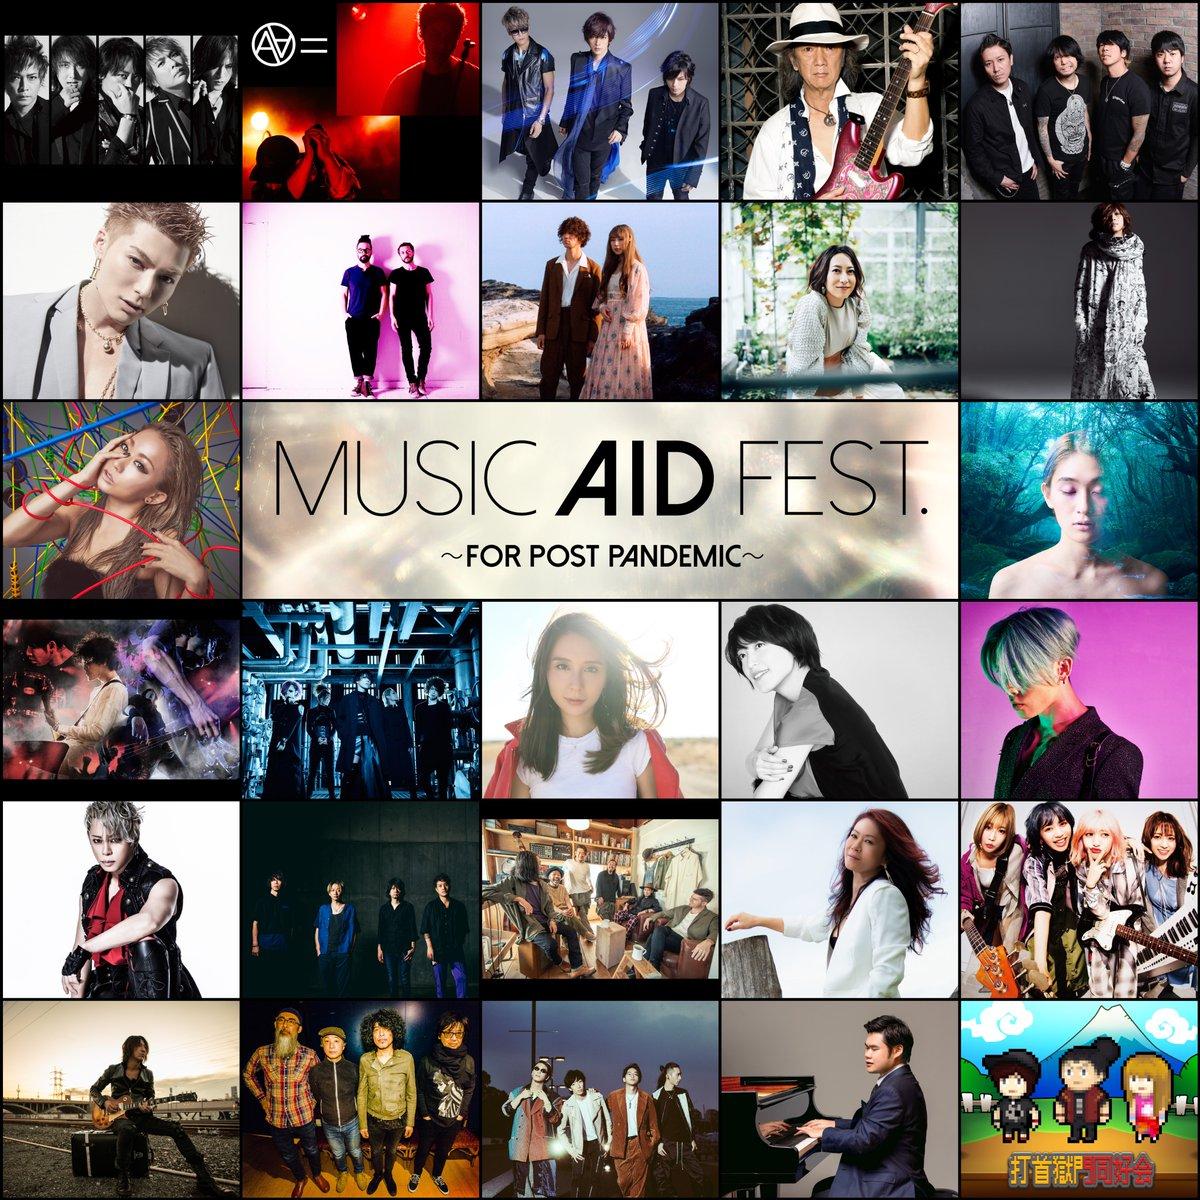 【BREAKERZ】本日オンエア!「MUSIC AID FEST.~FOR POST PANDEMIC~」5/31(日)18:00~21:00(生放送・生配信)※BREAKERZは19時台の放送予定です。■フジテレビONE スポーツ・バラエティ(スカパー!無料)■FODにて同時生配信(無料)